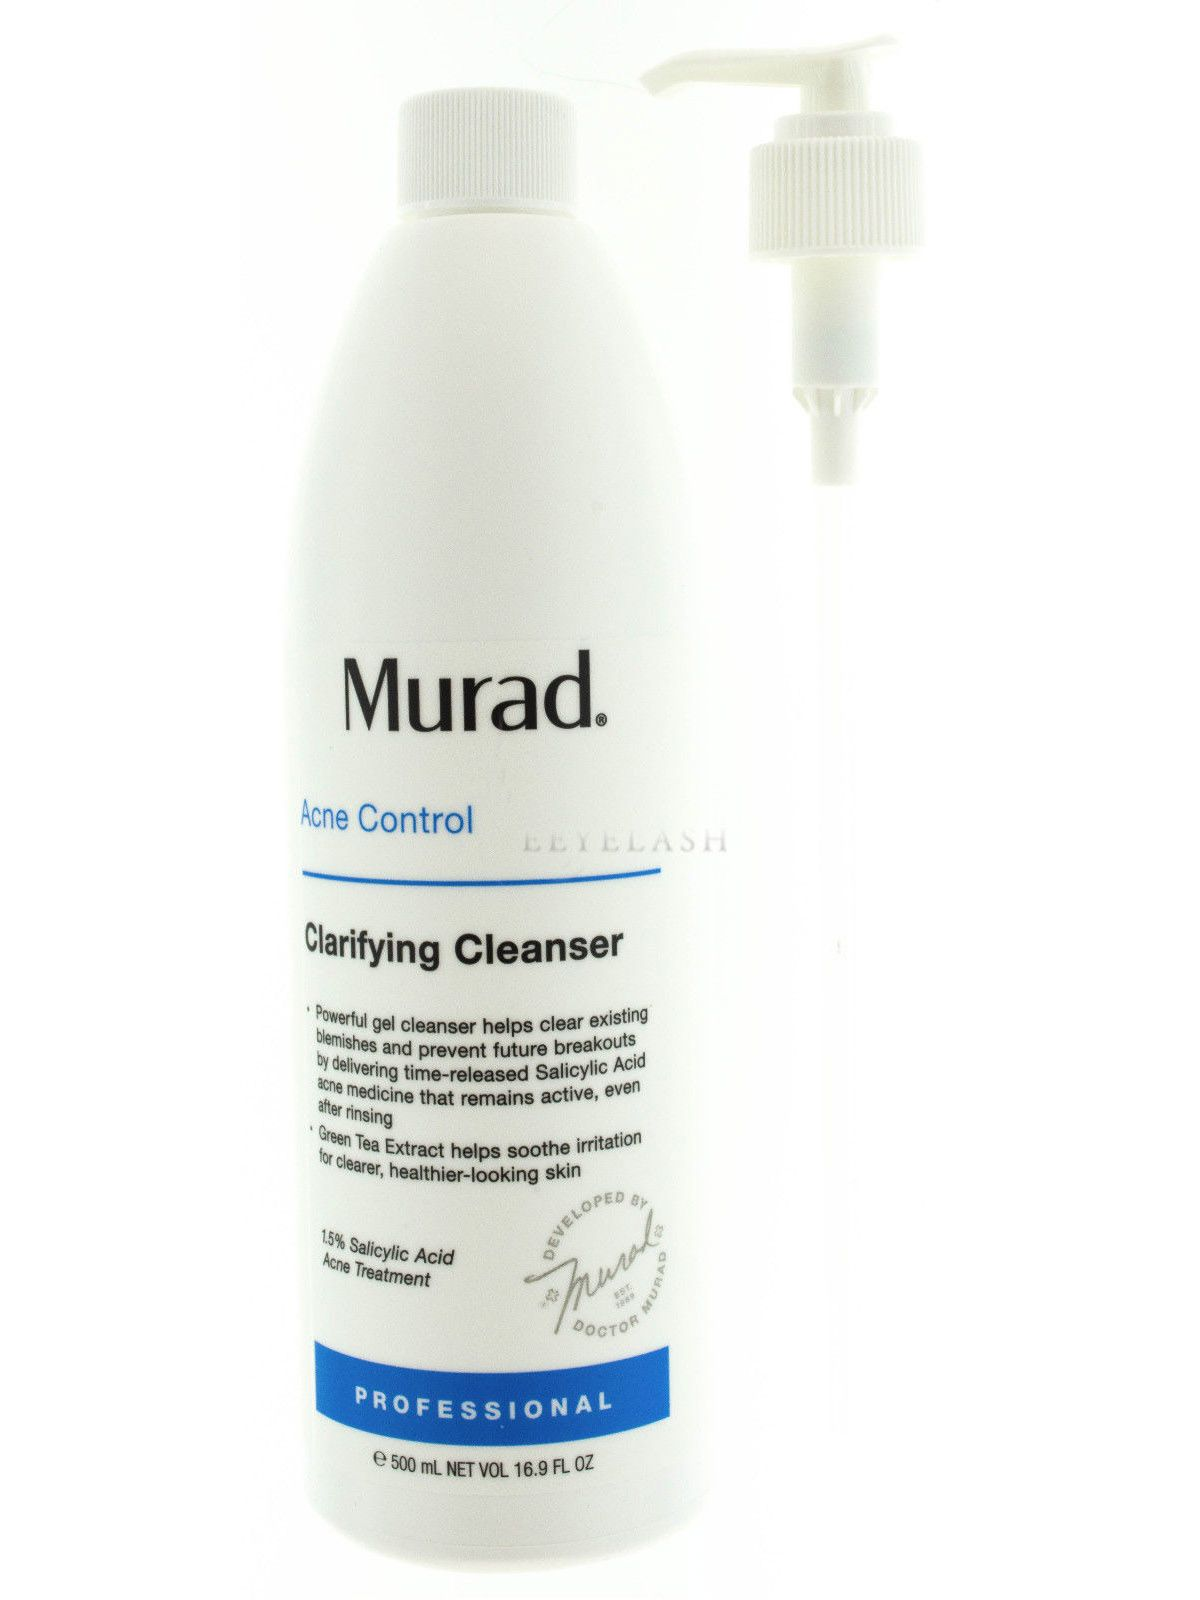 Best Acne Treatment 2020 Murad Acne Clarifying Cleanser Pro Size 16.9 fl oz / 500 mL AUTH